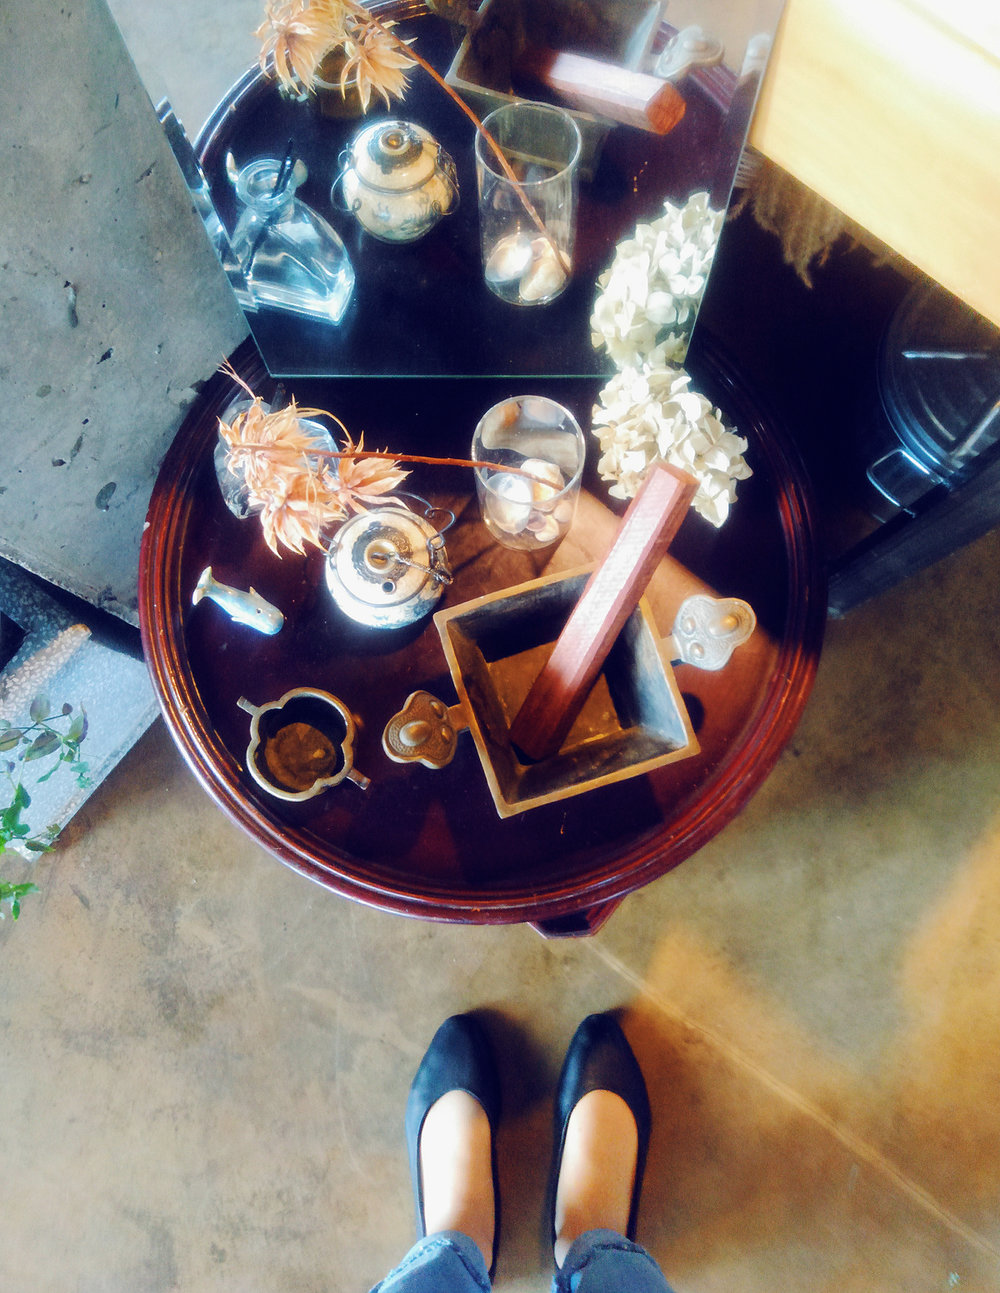 jeju-island-detox-cafe-decor.jpg